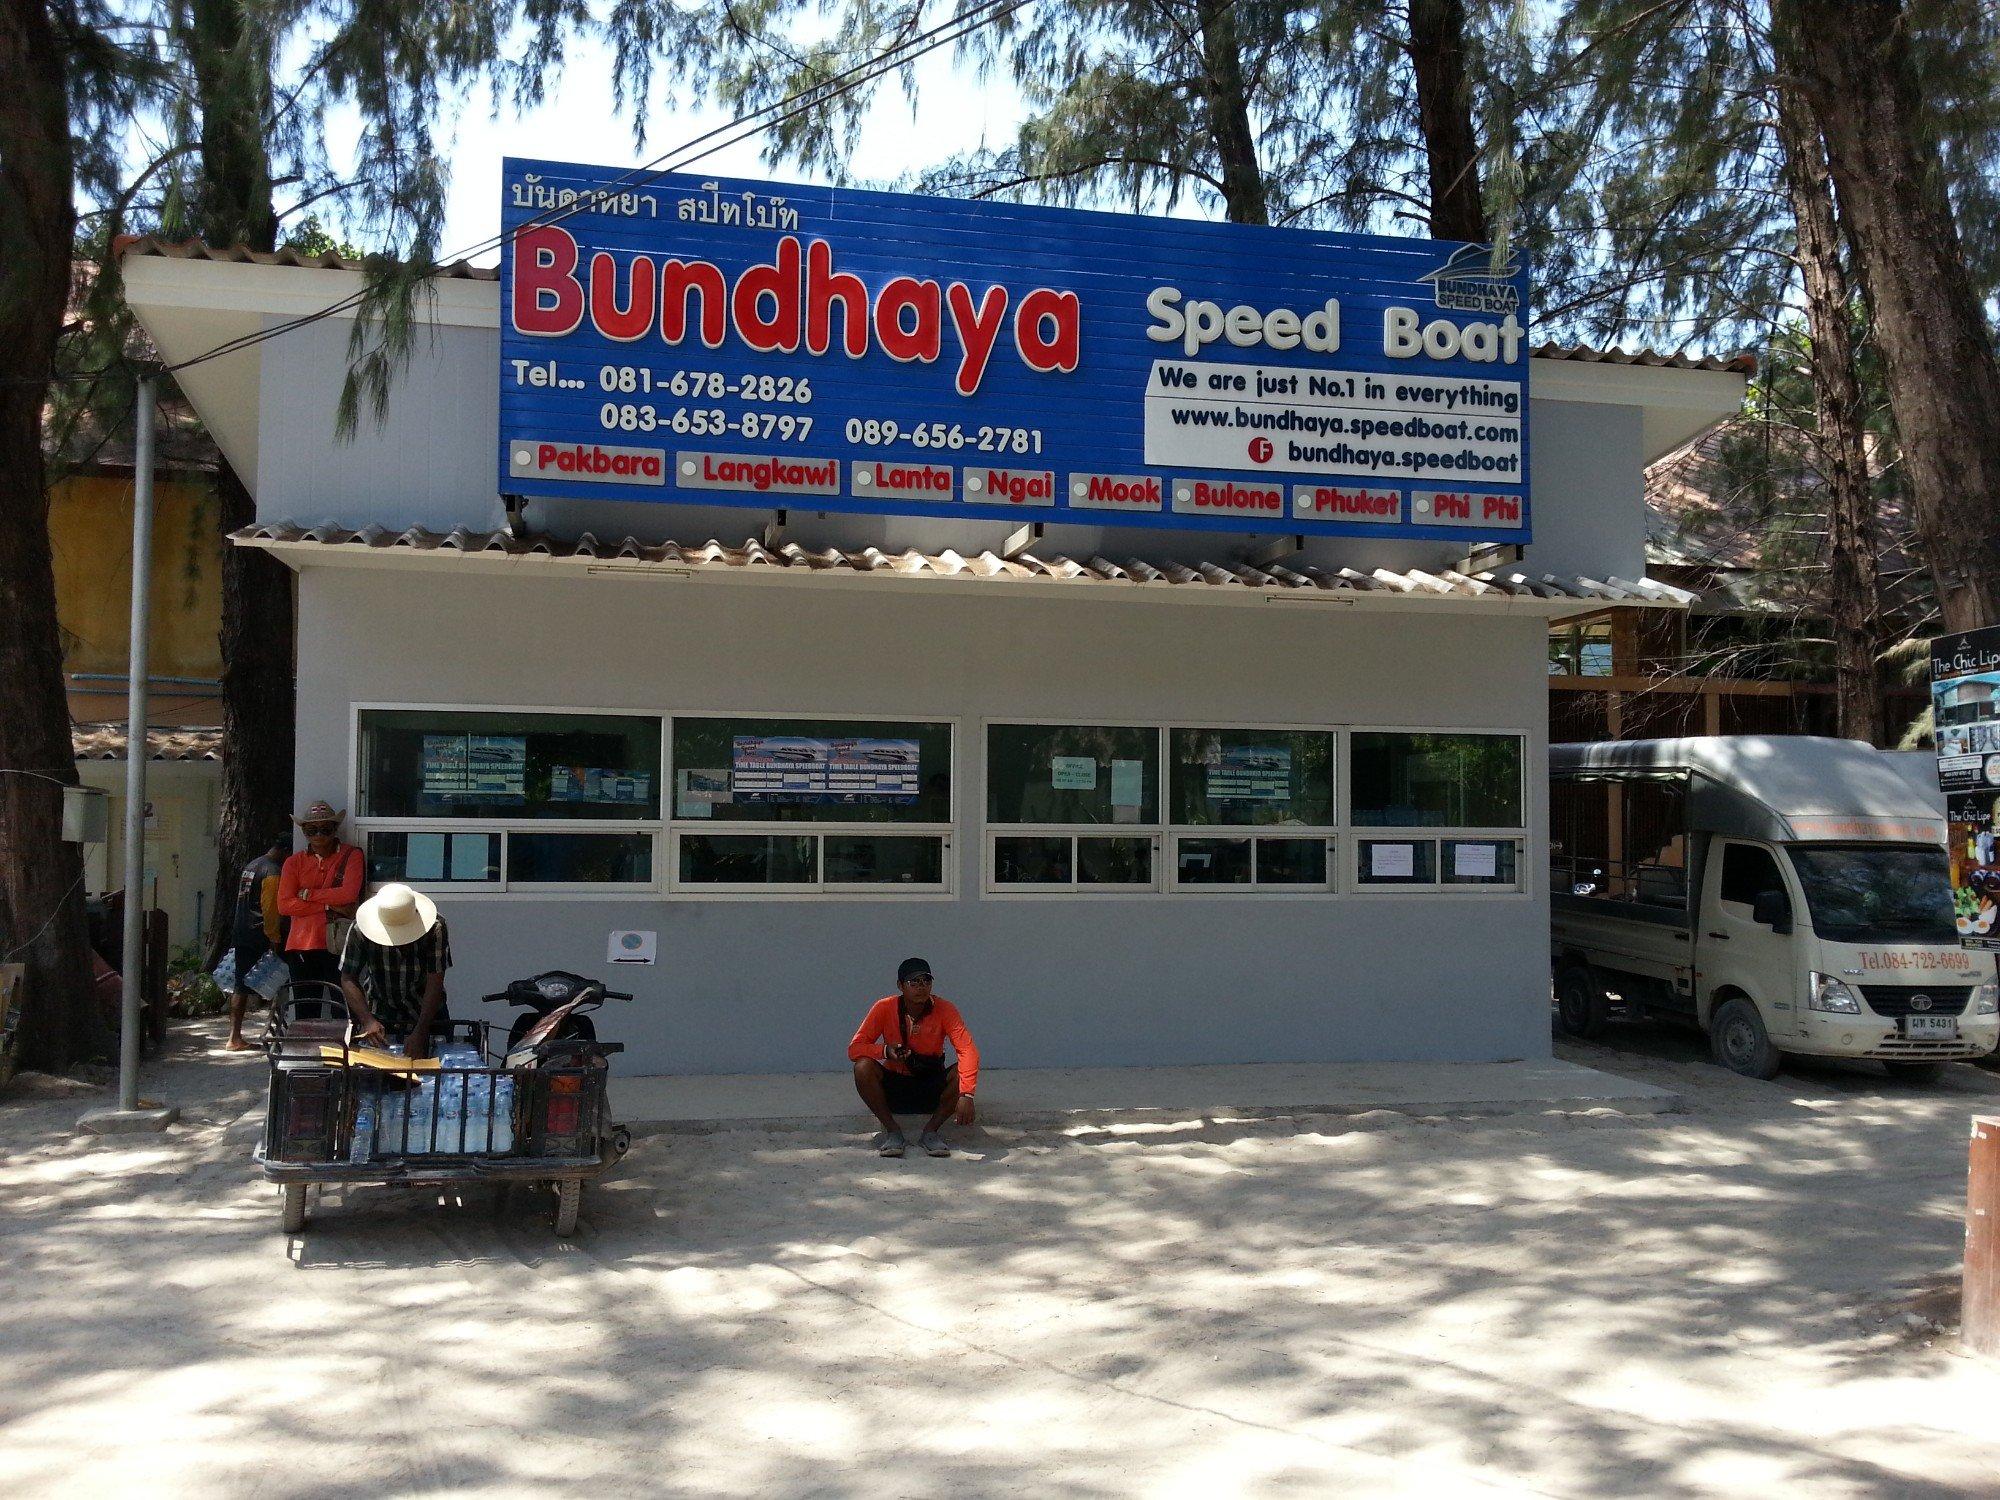 Bundhaya Speed Boat office in Koh Lipe